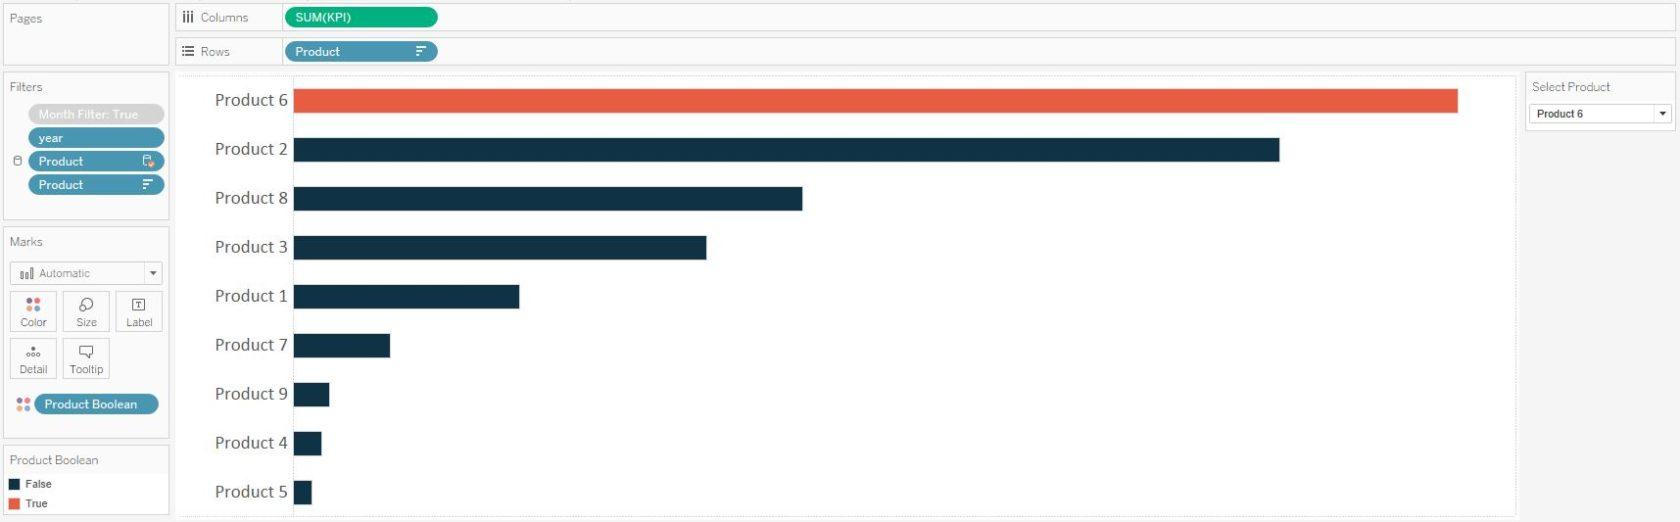 Tableau Bar Chart with Highlight